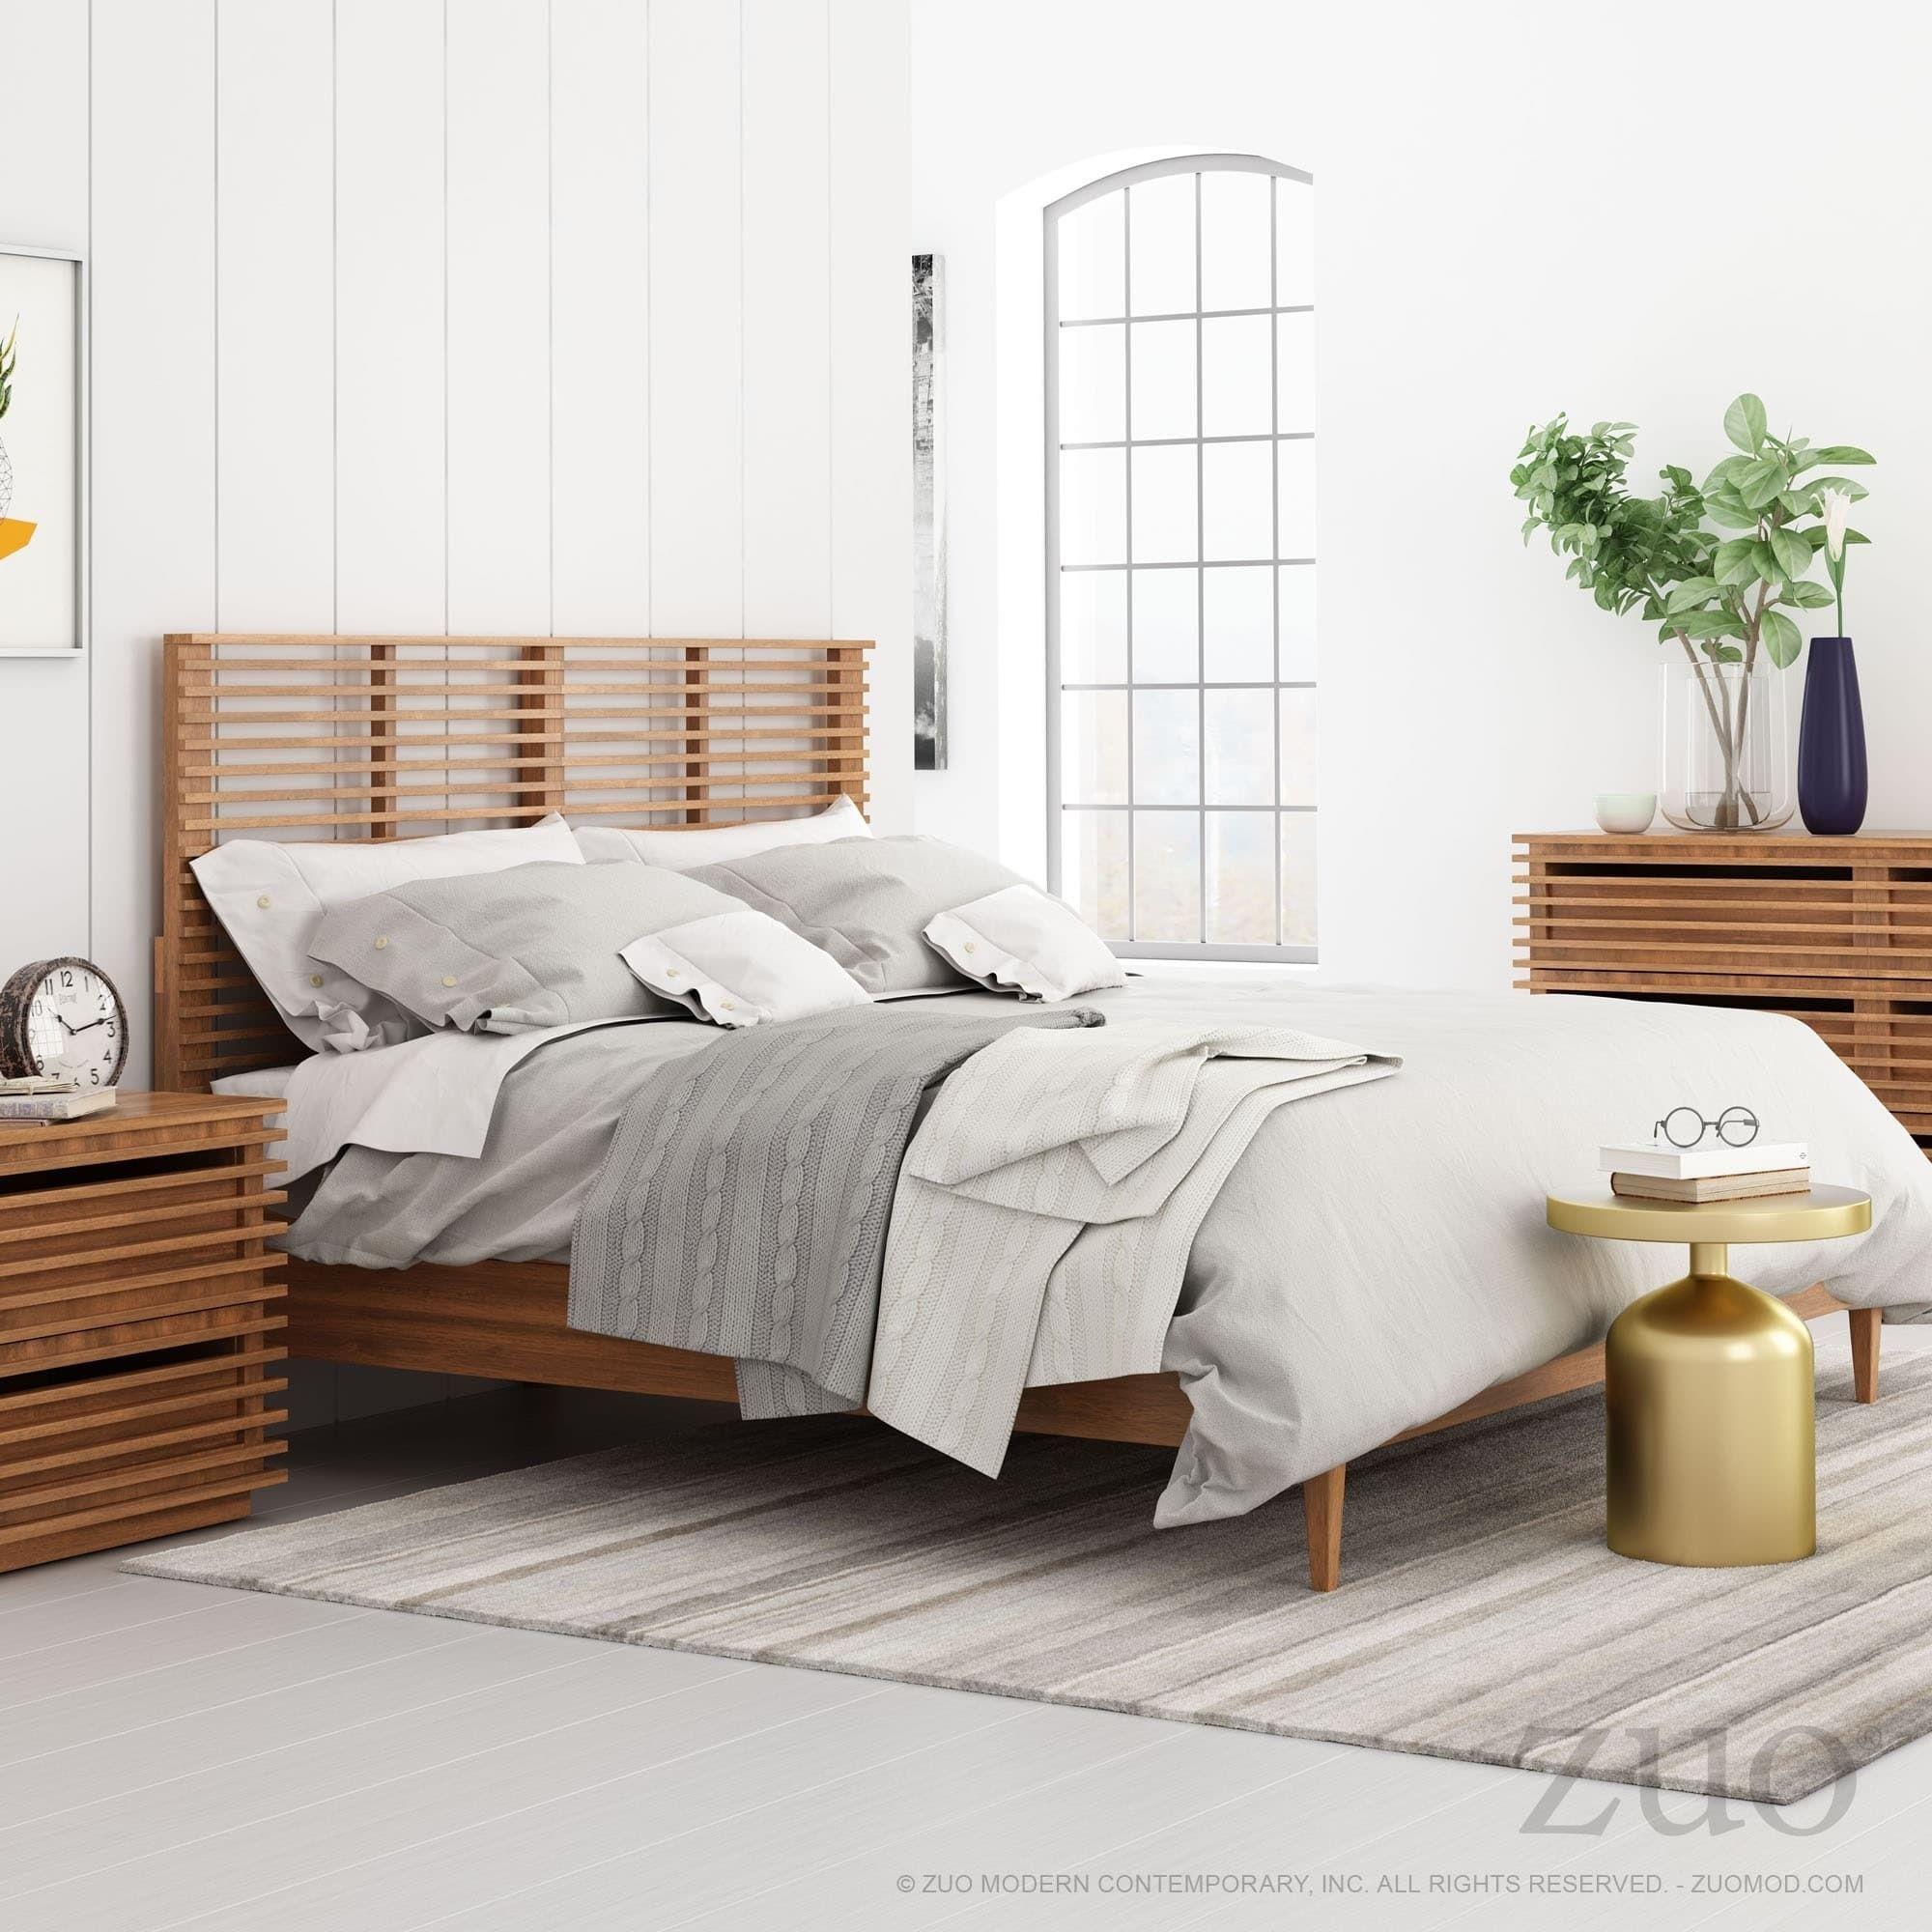 Linea Walnut Finish Wood King Headboard, Brown | Products ...